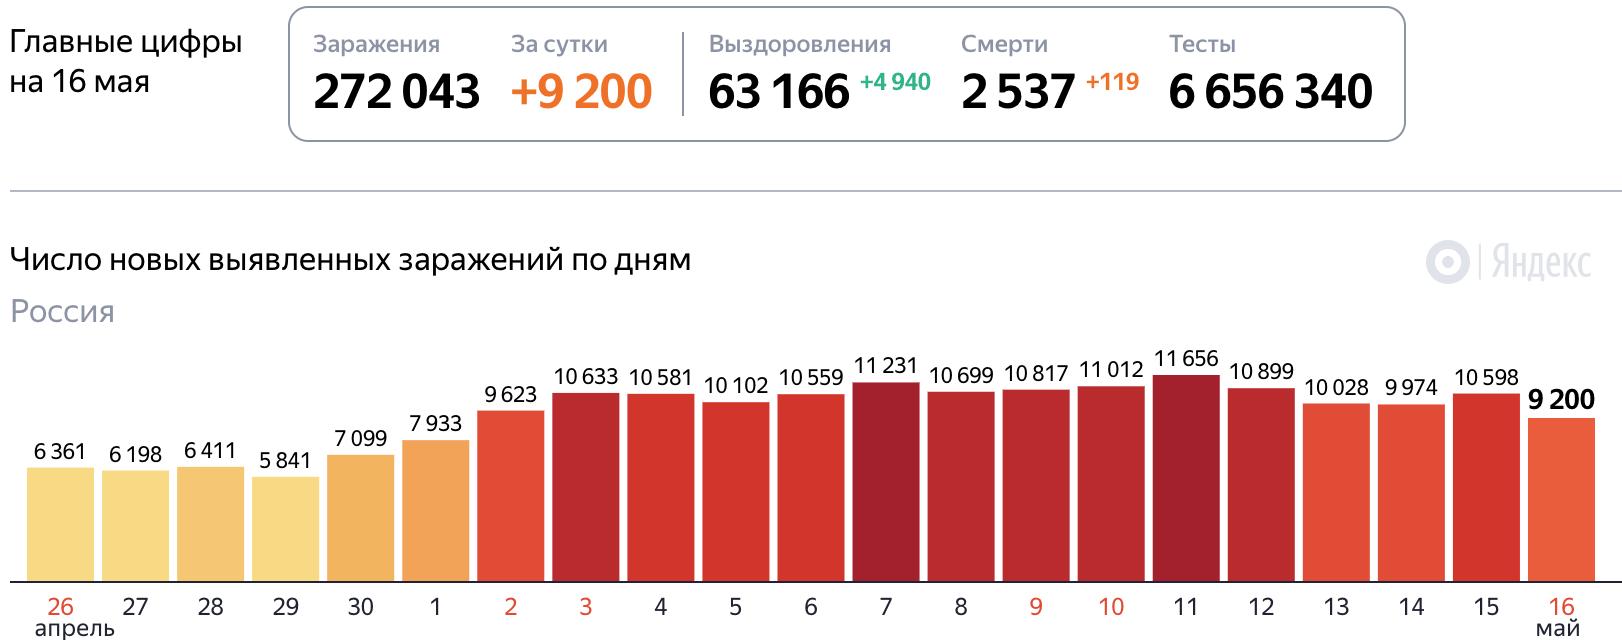 Коронавирус на 17 мая 2020 года статистика в России